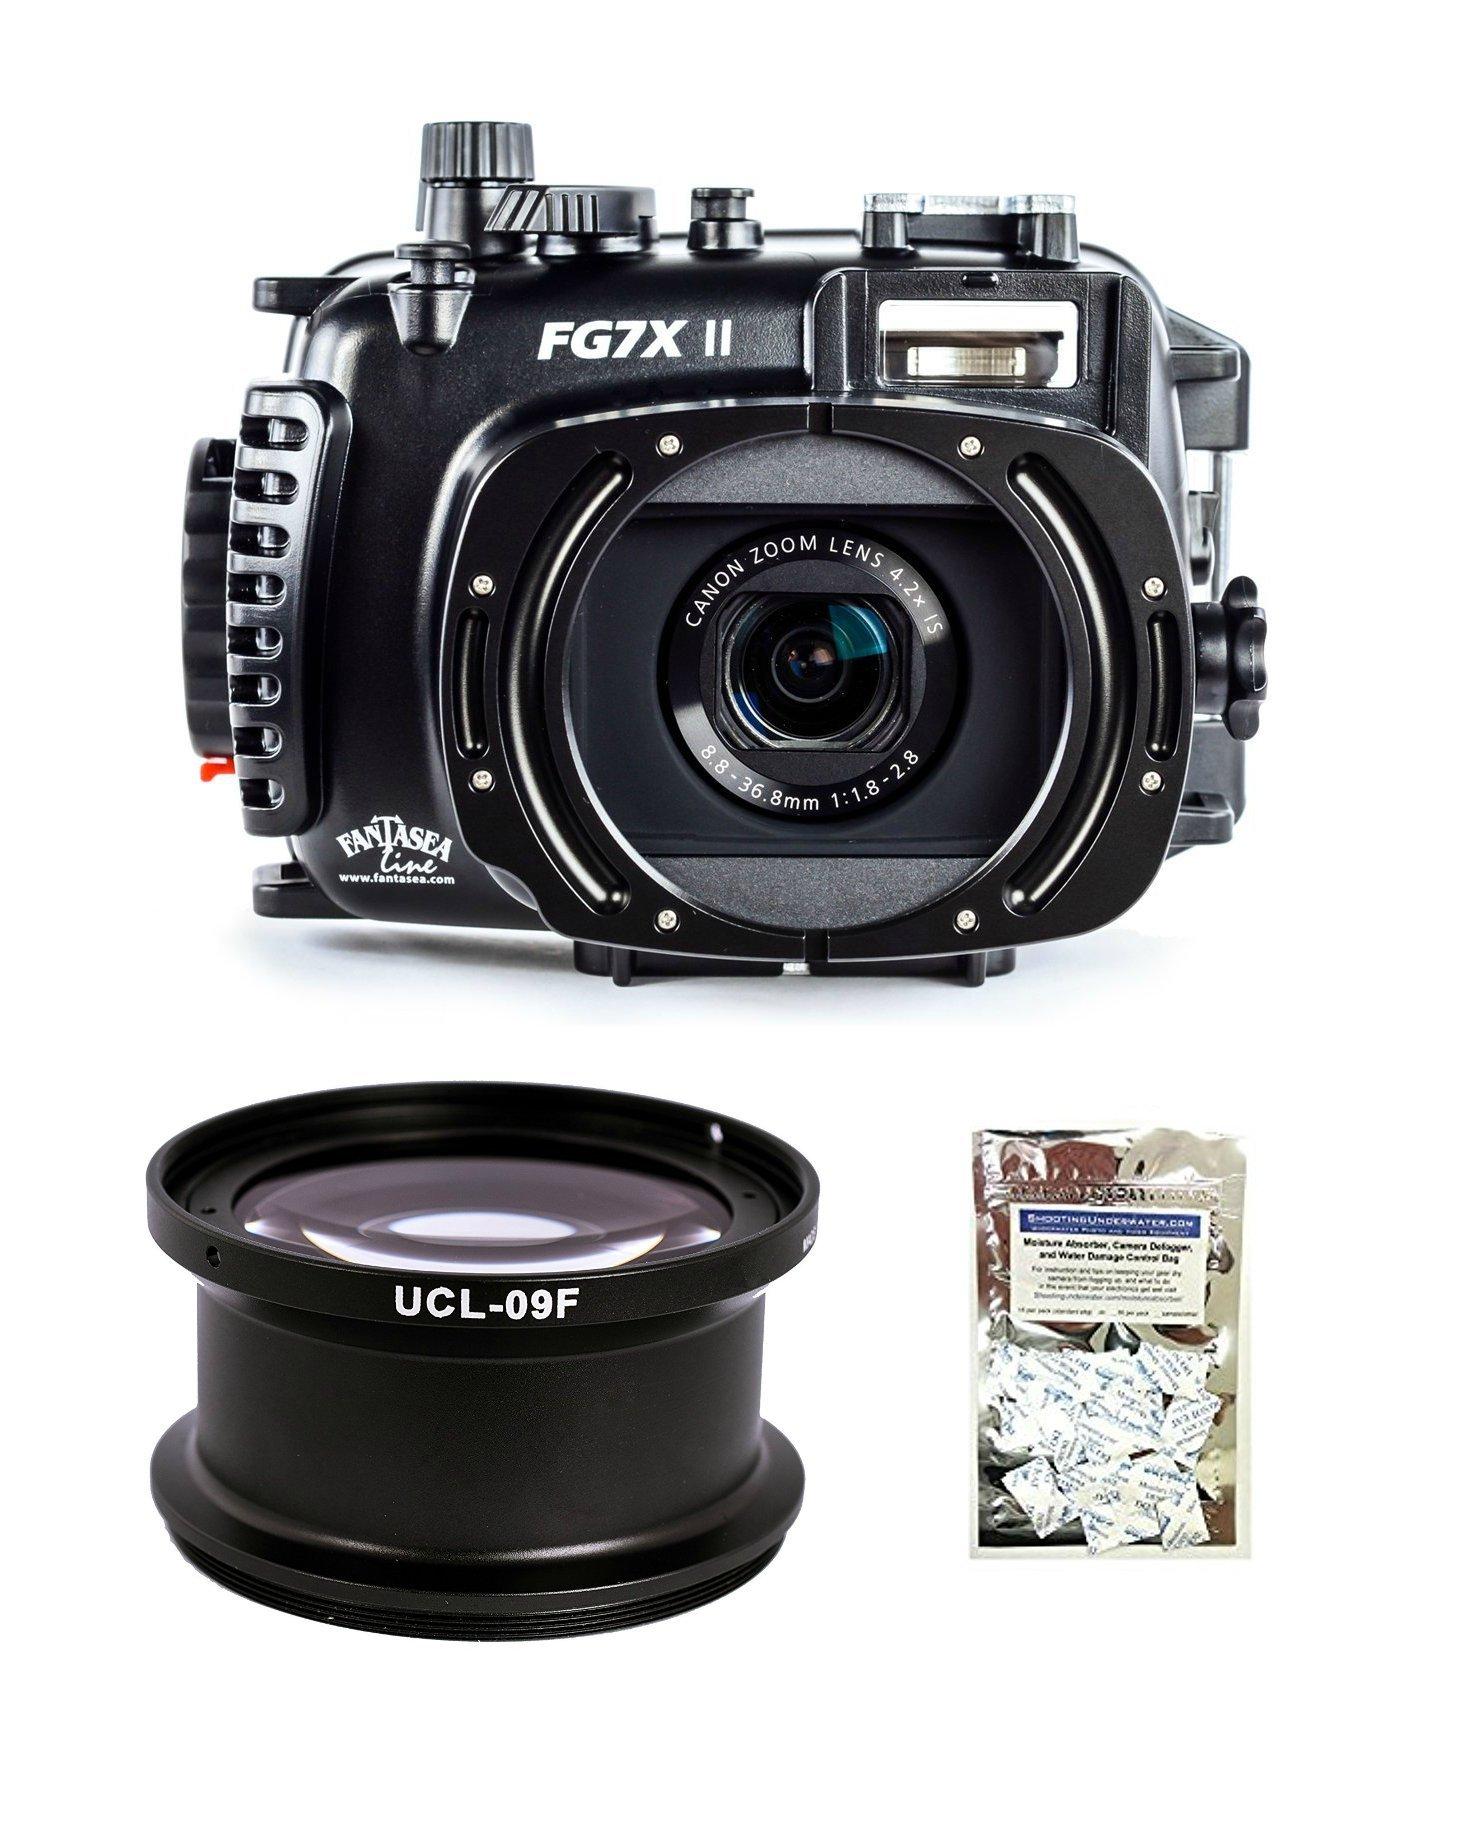 Fantasea FG7X II Housing for Canon Canon G7 X Mark II w/UCL-09F +12.5 Super Macro Wet Lens & Moisture Absorbers